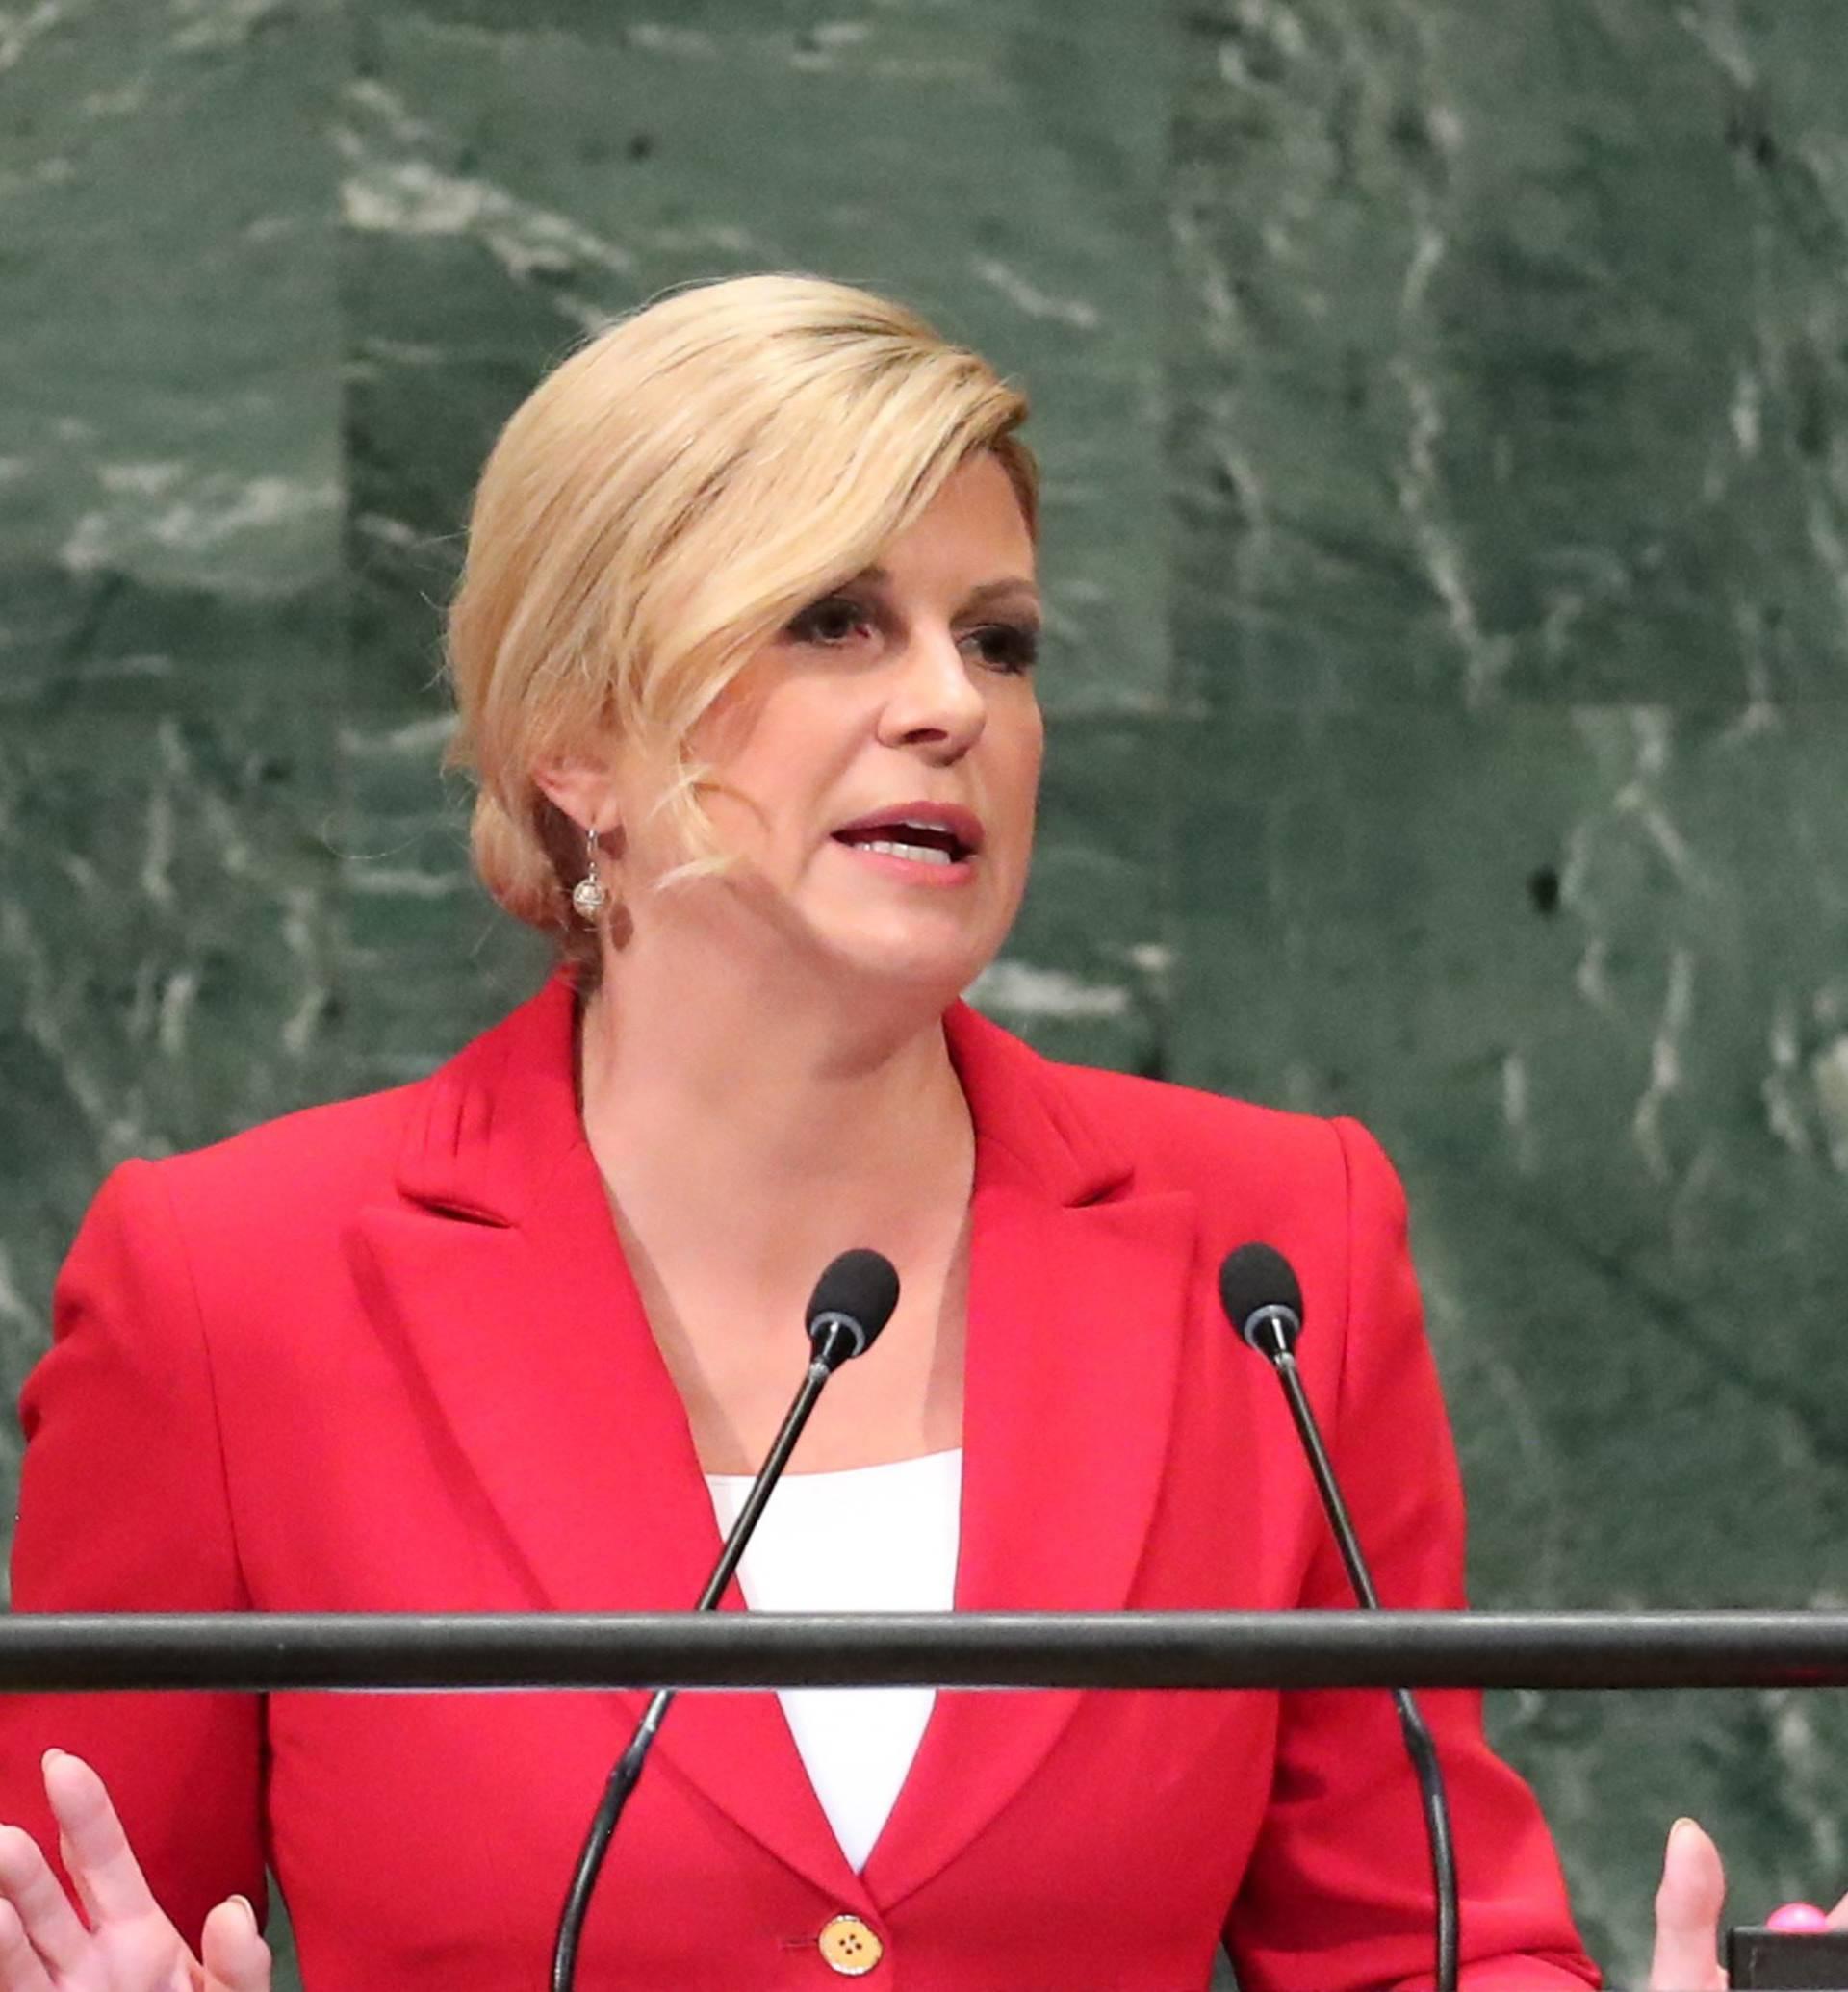 Croatia's President Kolinda Grabar-Kitarovic addresses the United Nations General Assembly in New York